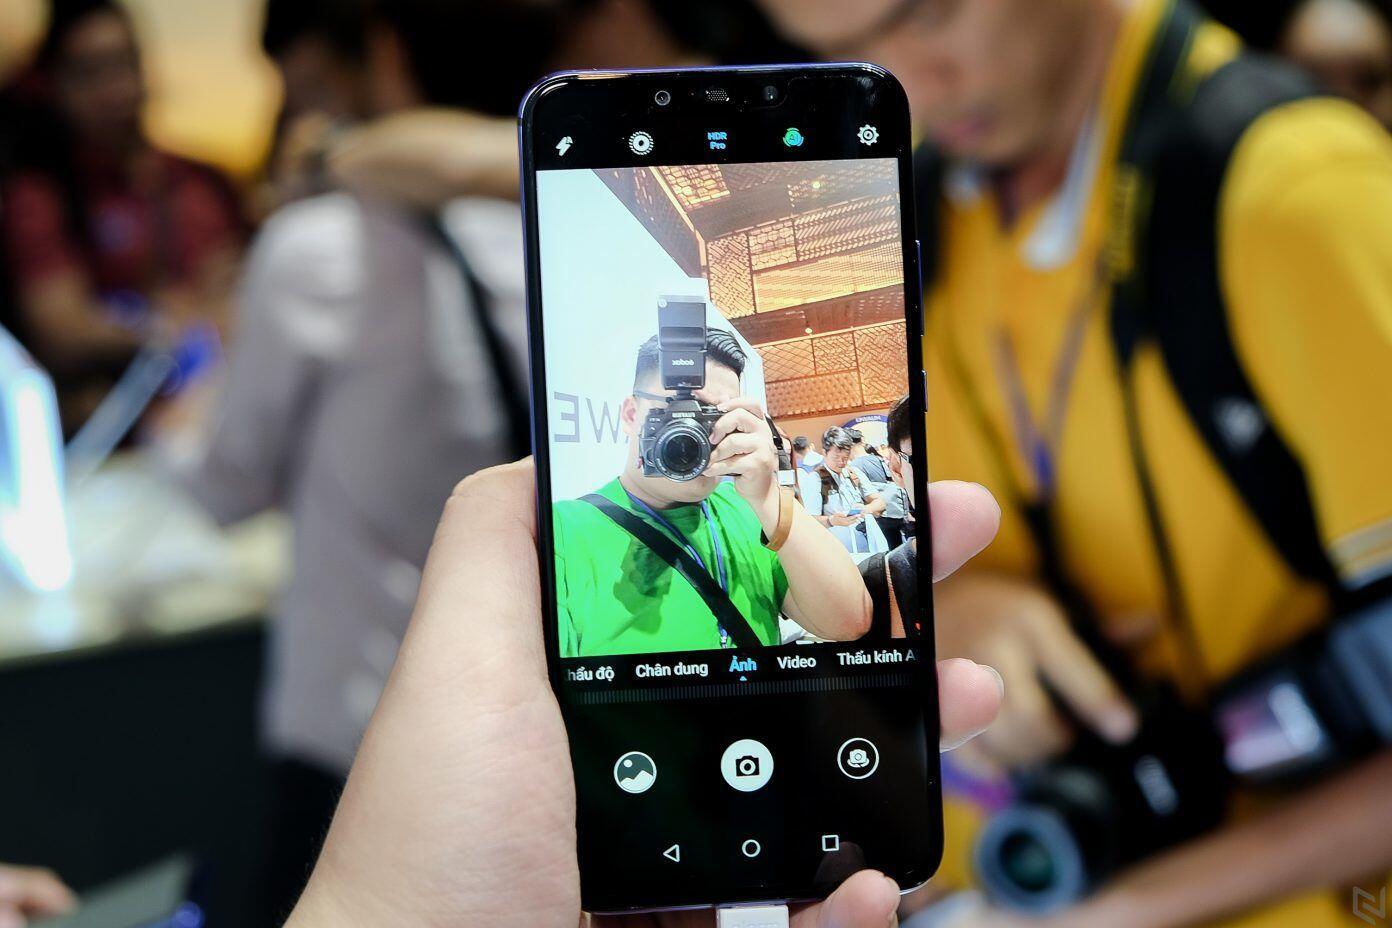 Teknologi Cerdas, 7 Keistimewaan Ini Siap Didapat dari Huawei Nova 3i